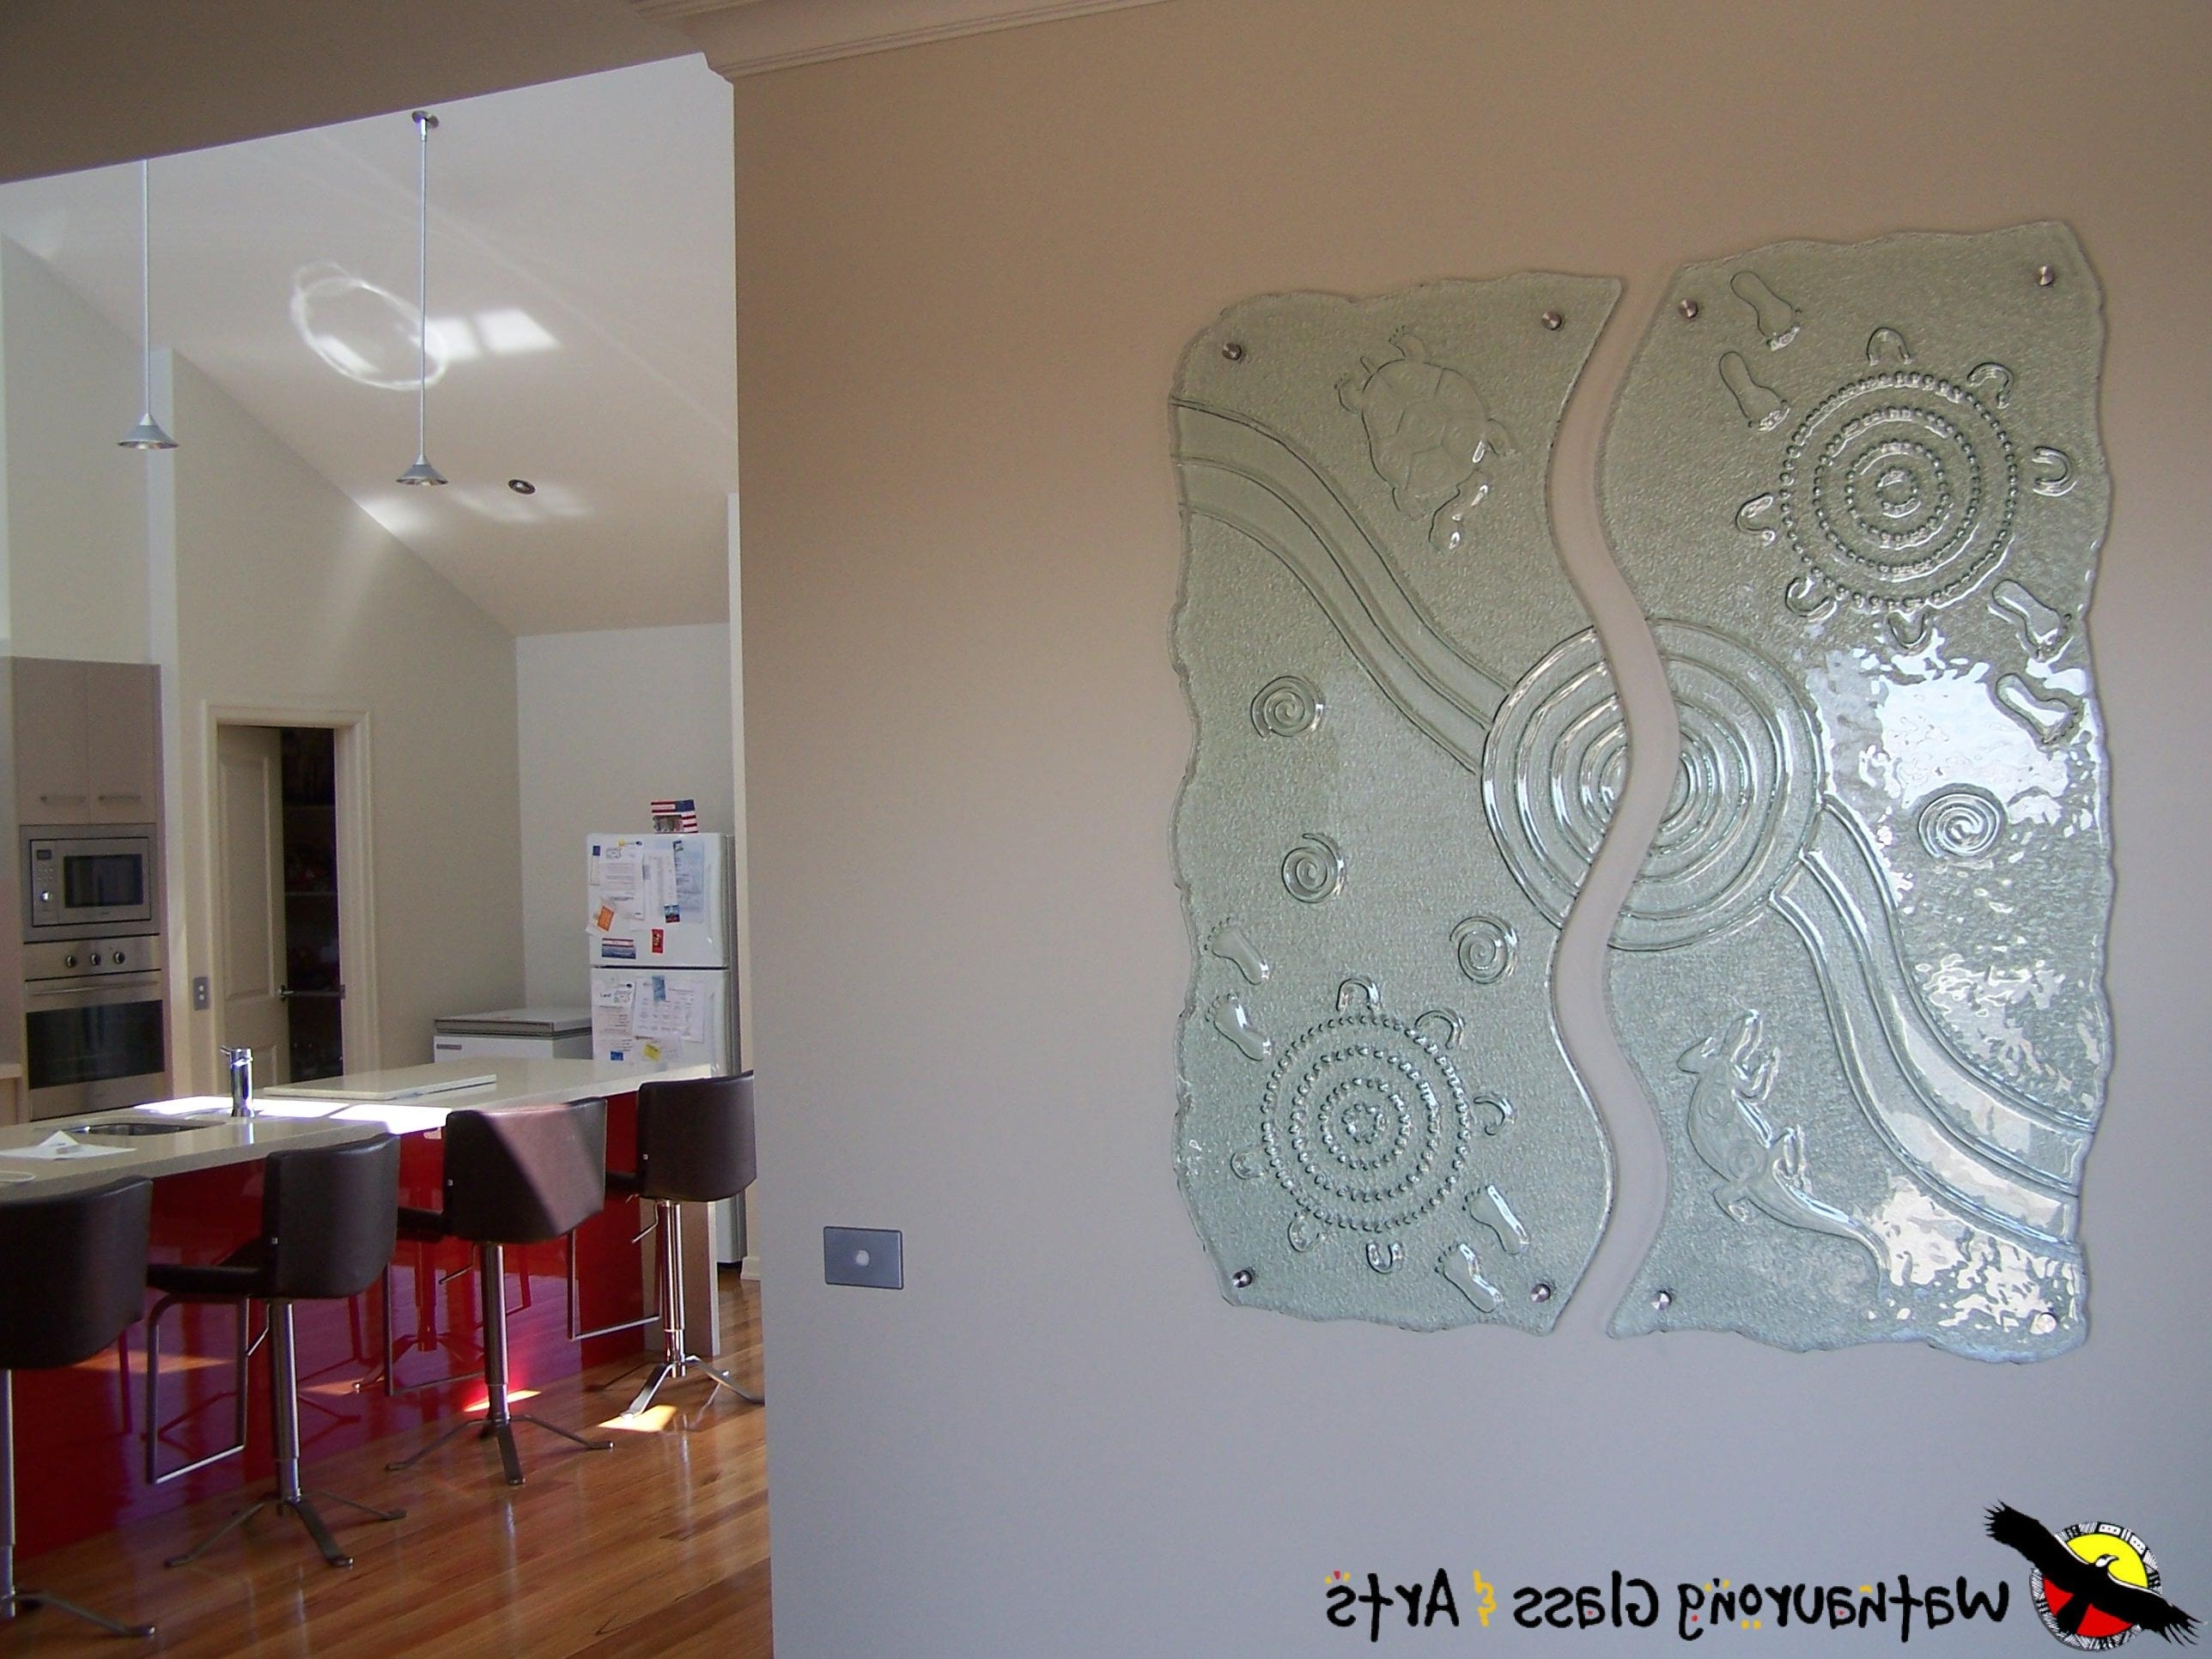 Internal Glass Wall Art – Wathaurong Glass Pertaining To Latest Glass Wall Art Panels (View 9 of 15)